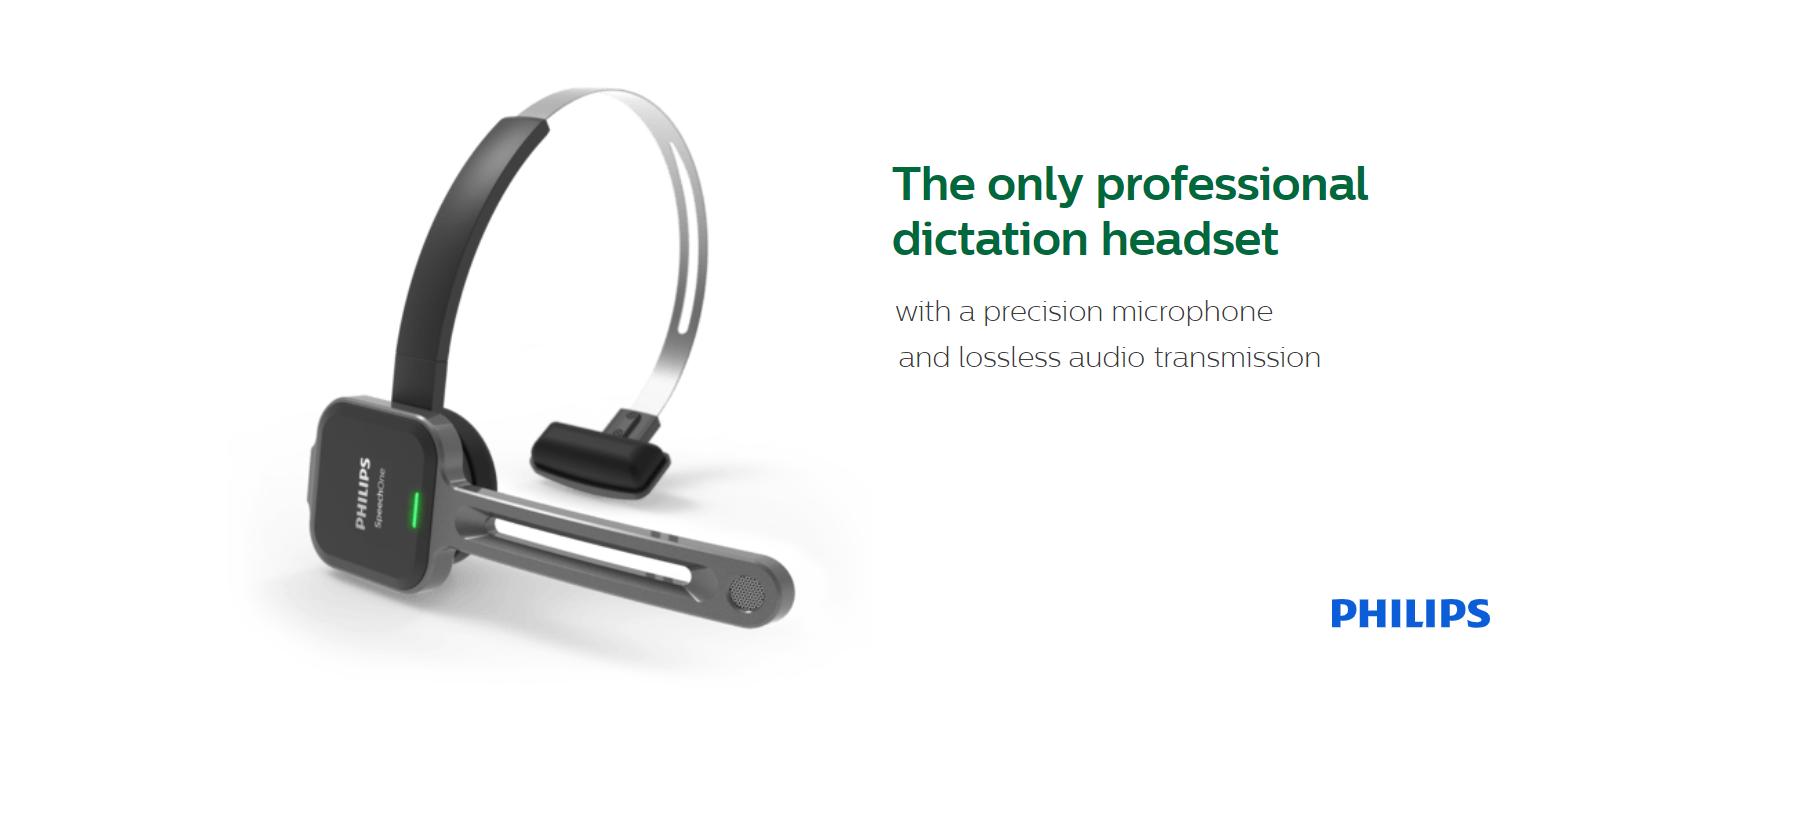 Philips SpeechOneWireless Dictation Headset